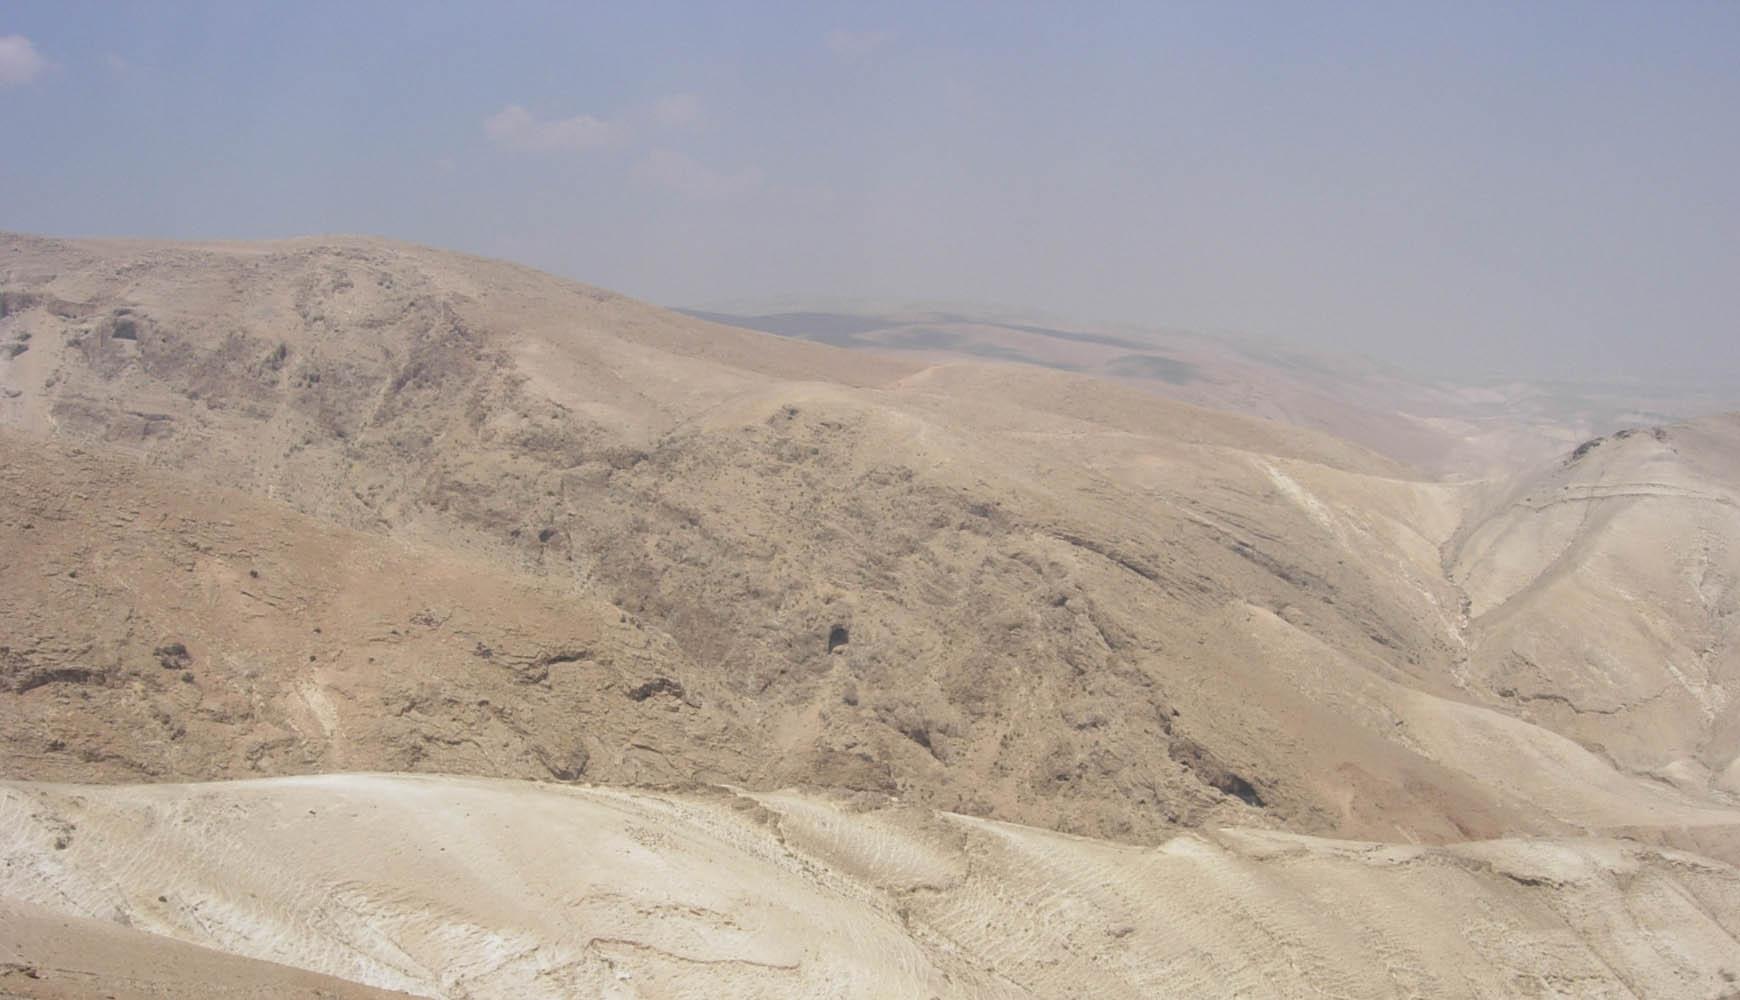 Jericho/Dead sea